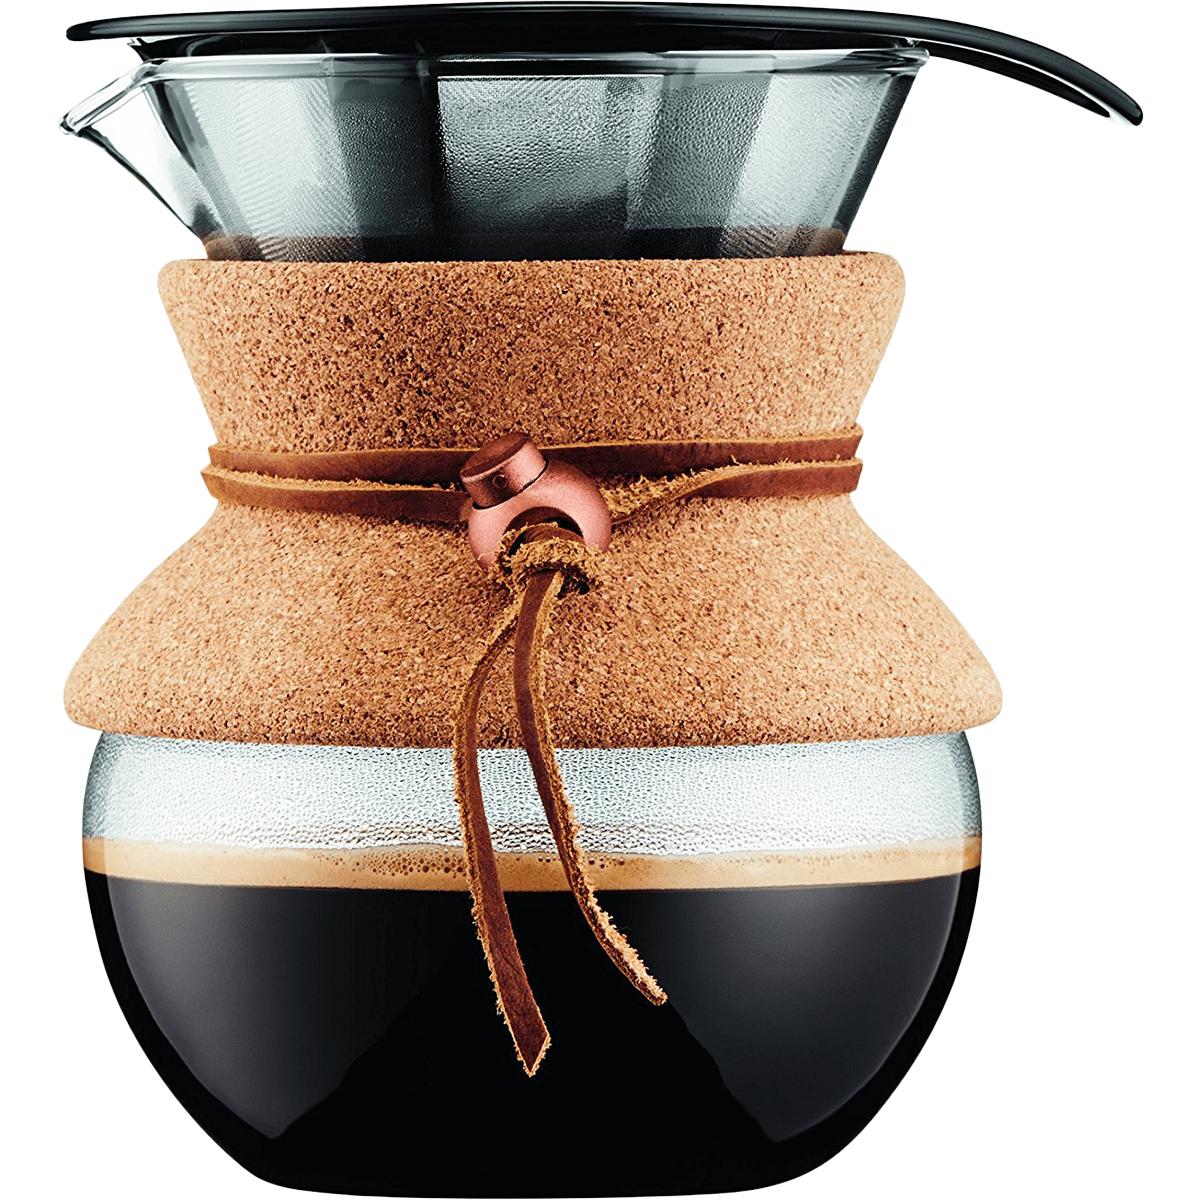 Bodum Cork Series Pour Over Coffee Maker - 17 Oz.